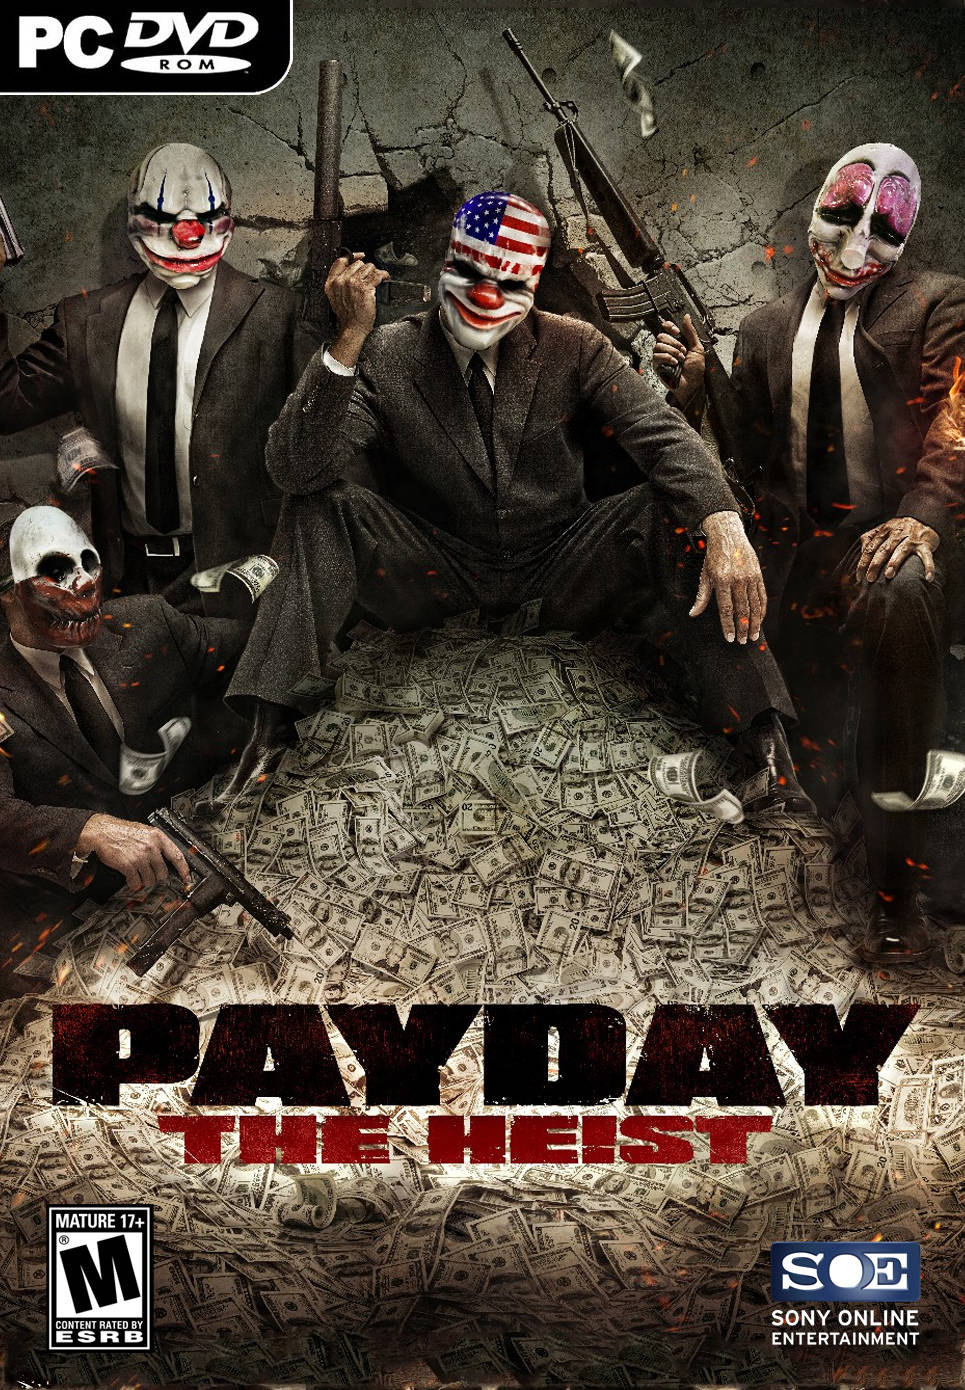 Payday: The Heist FullRip BLACKBOX 610300219